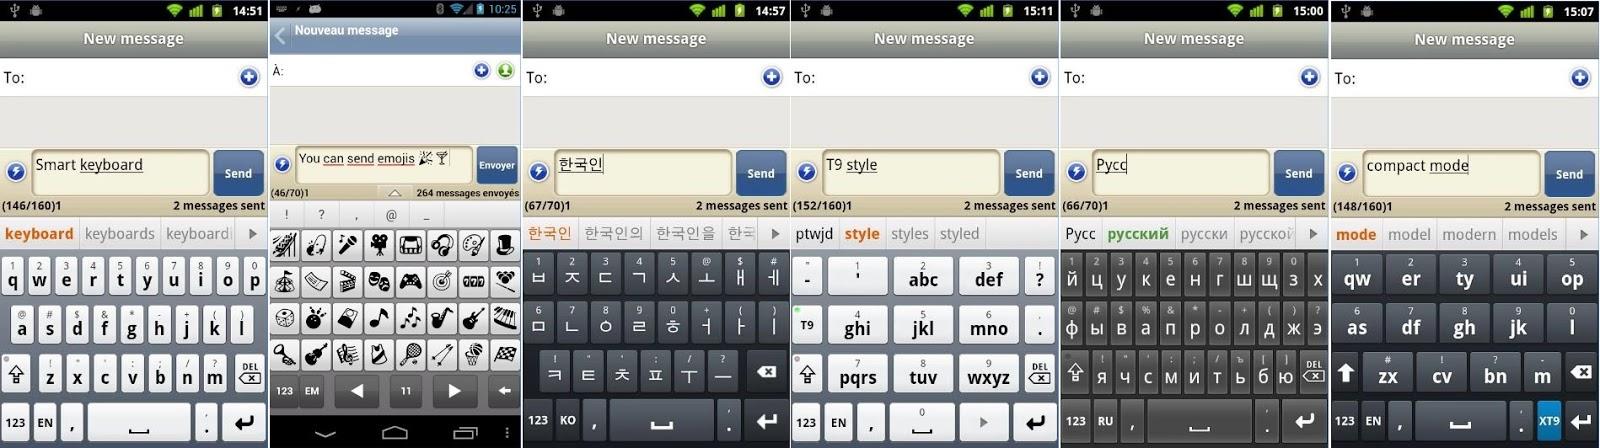 Aplikasi Keyboard Android Terbaik yang Ringan